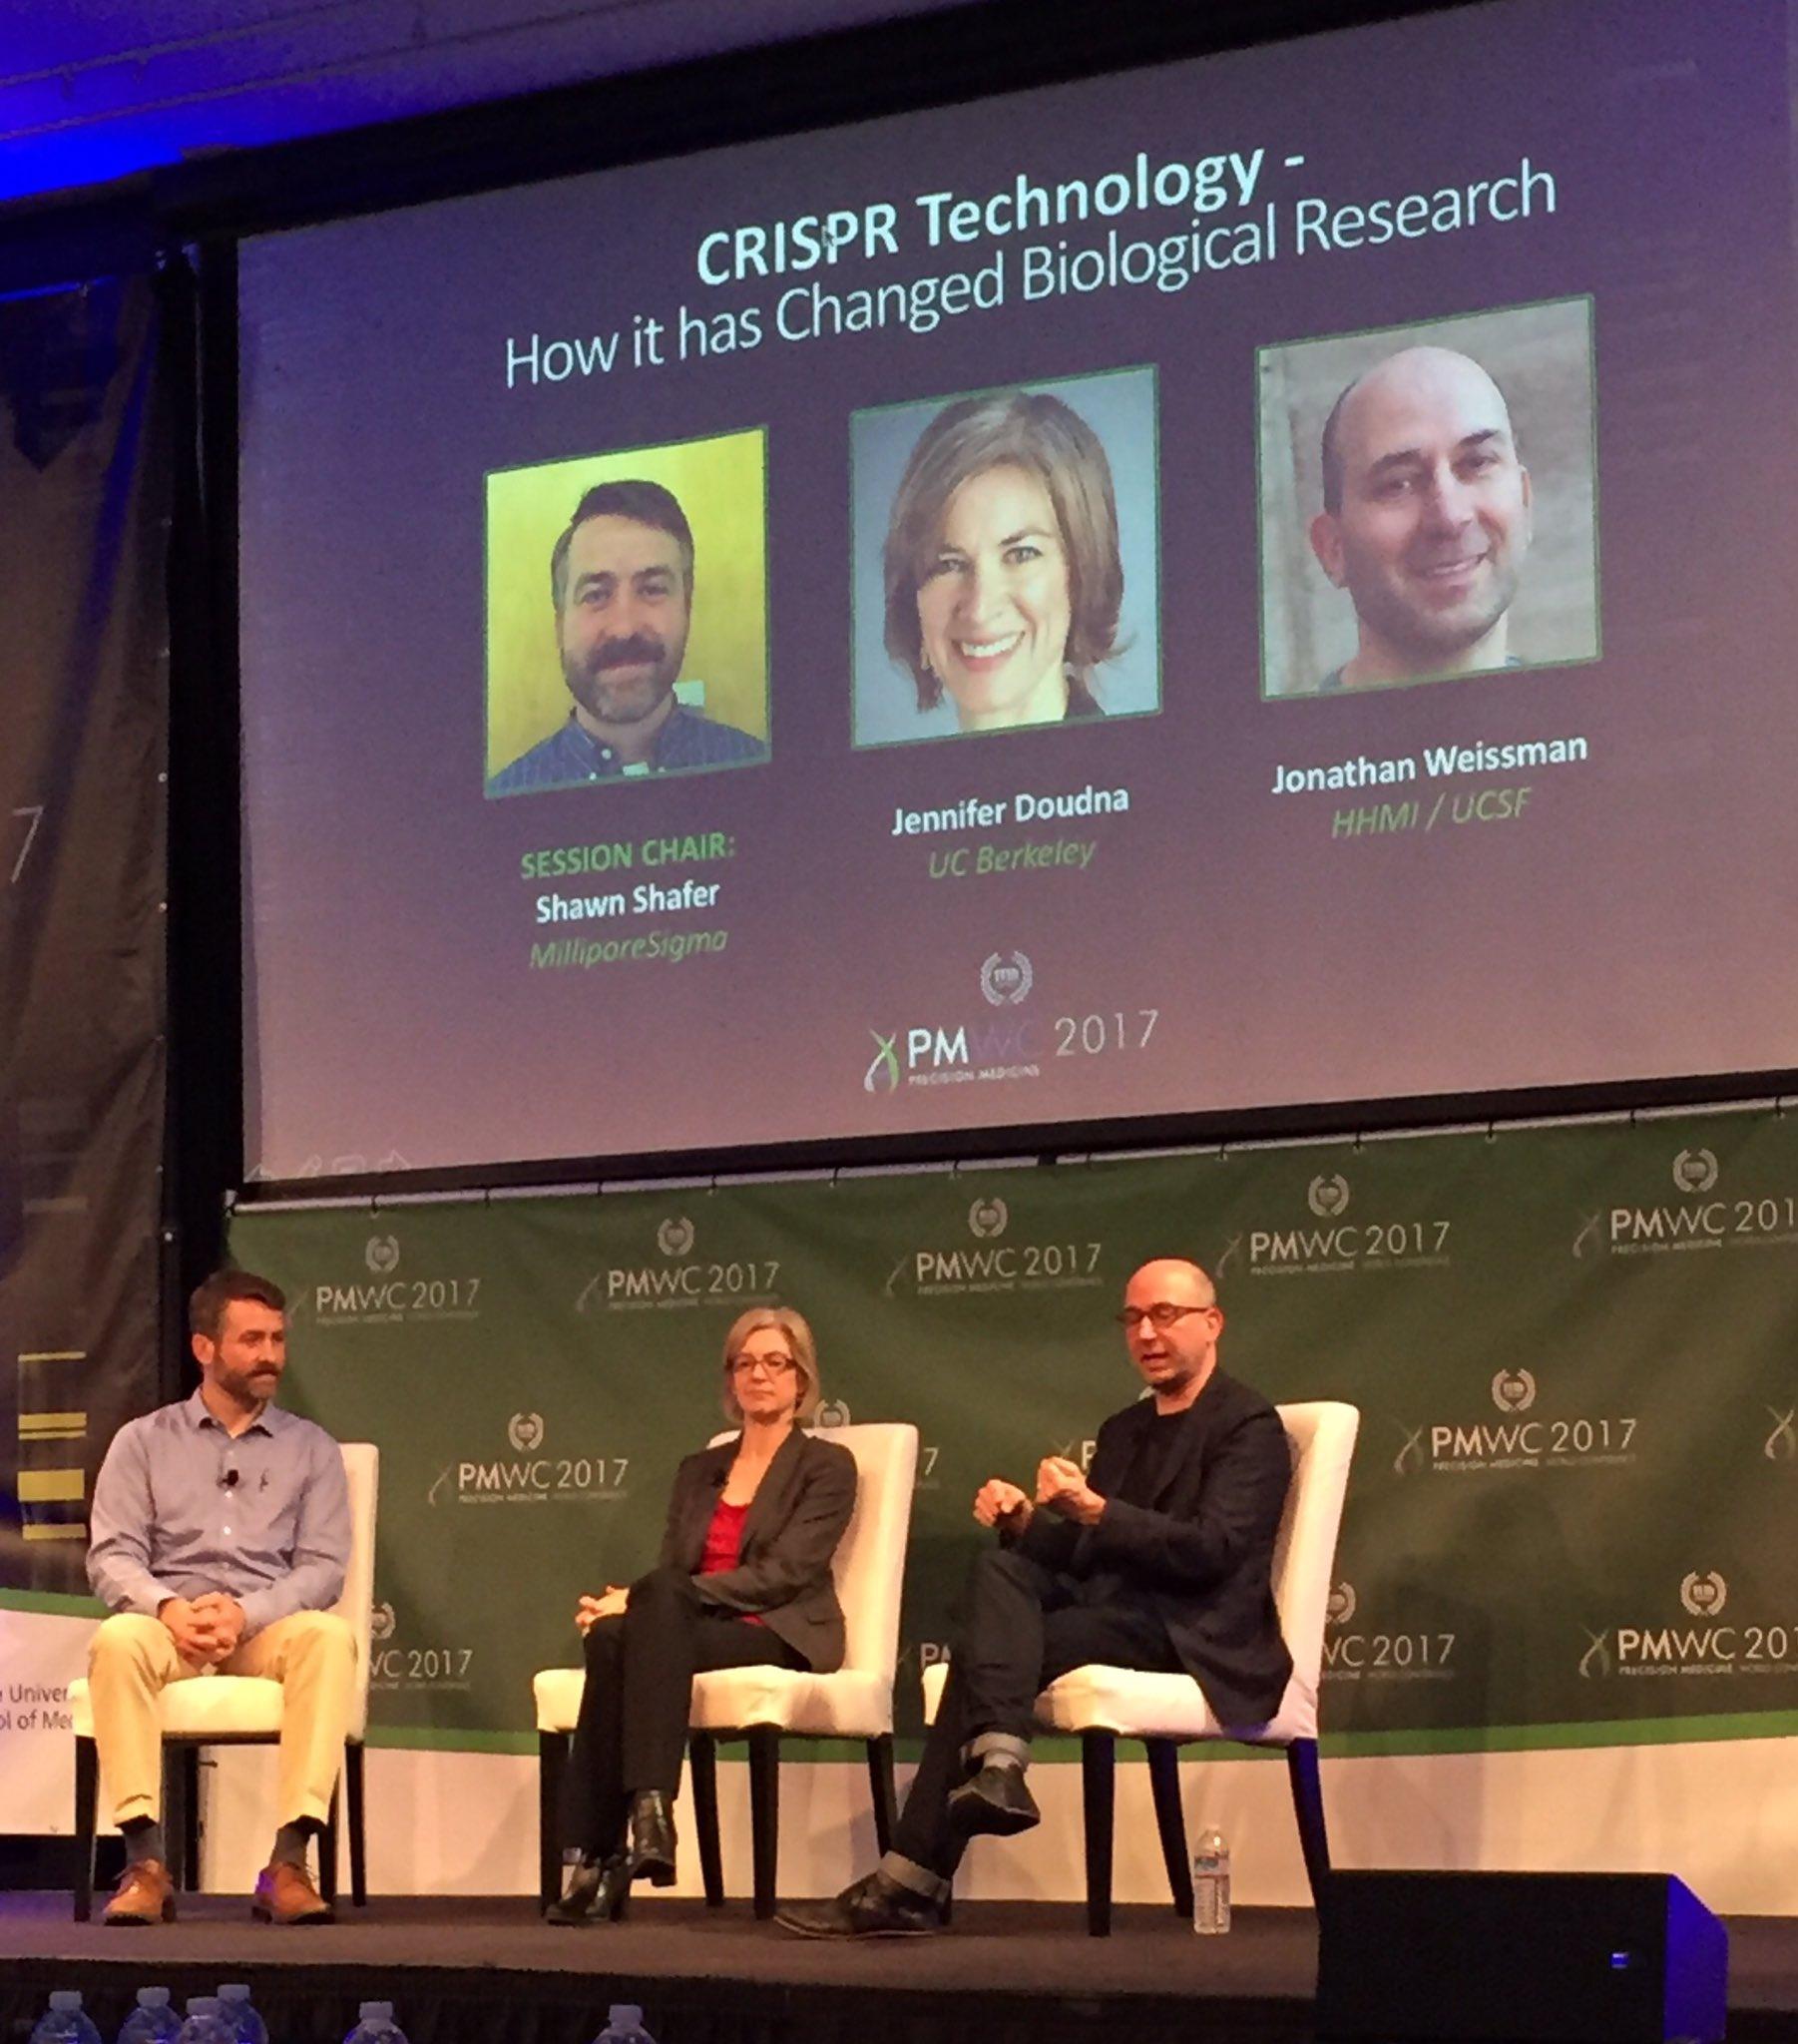 "Great discussion ""off-target effects of #CRISPR"" #PMWC17 talks Jennifer Doudna @UCBerkeley, Jon Weissman @UCSF, Shawn Shafer @SigmaAldrich https://t.co/wbEMePnrKL"